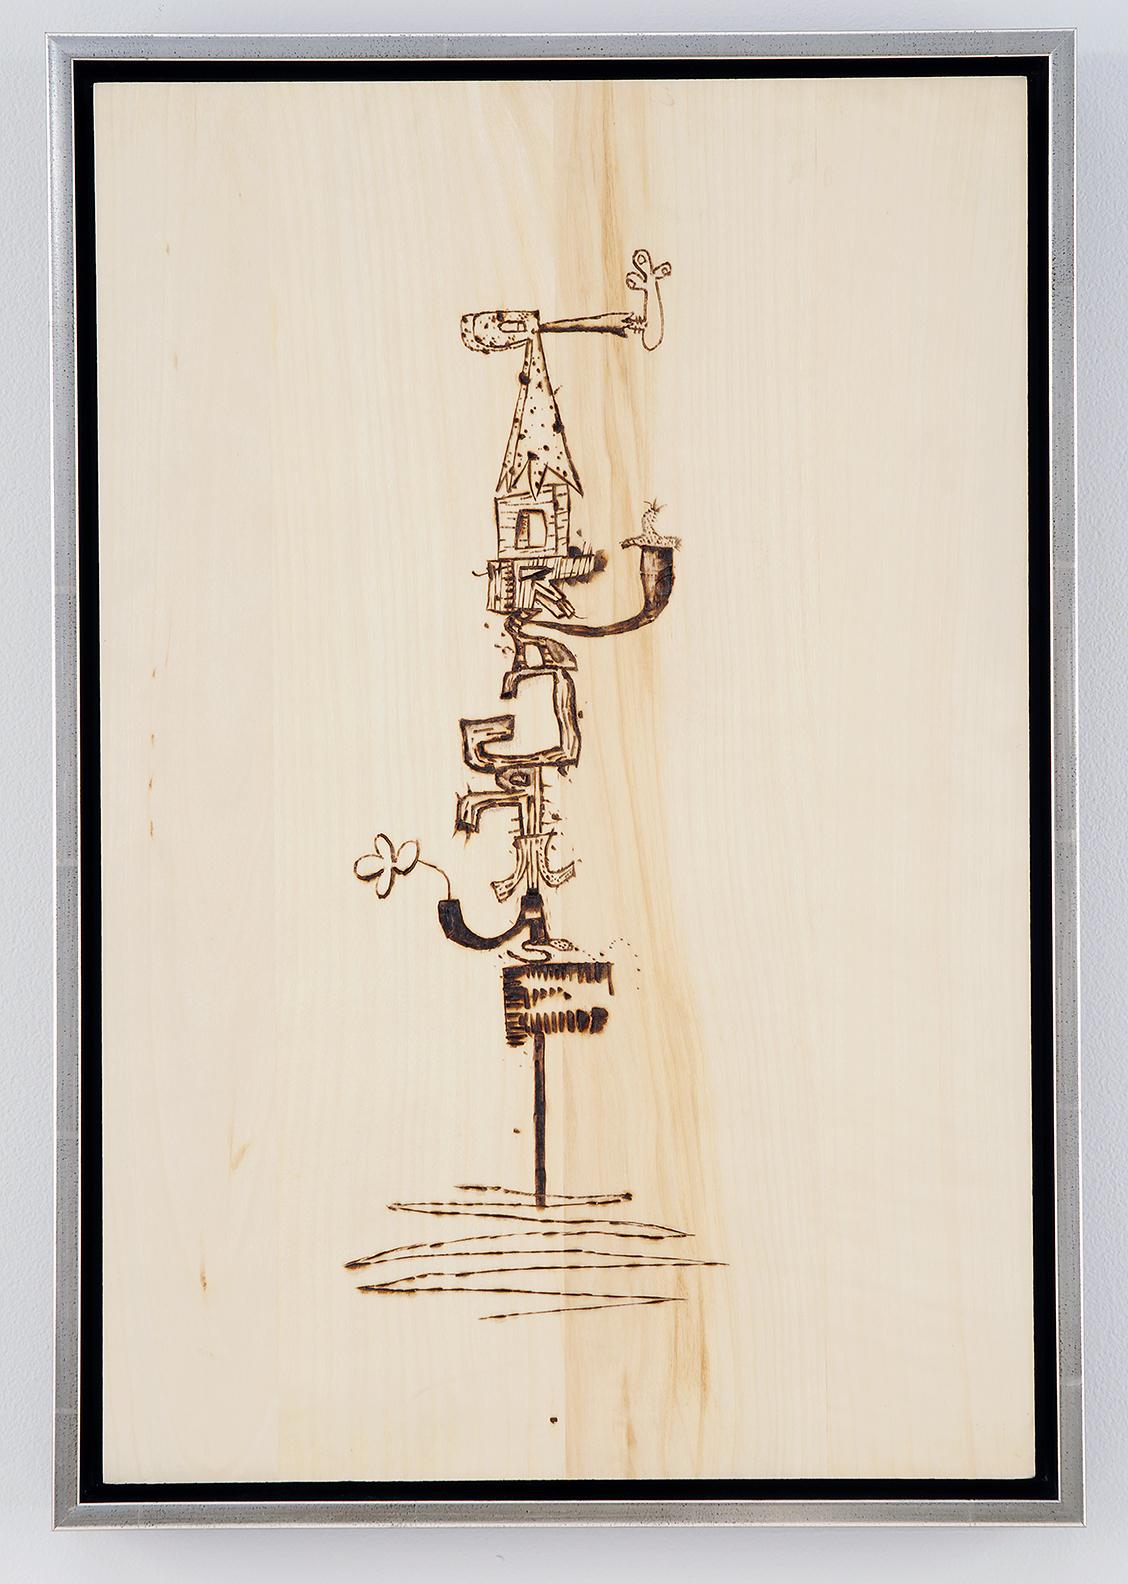 WAYNE WHITE, Pork Grease, 2008, wood burning, framed, 18 x 12 inches